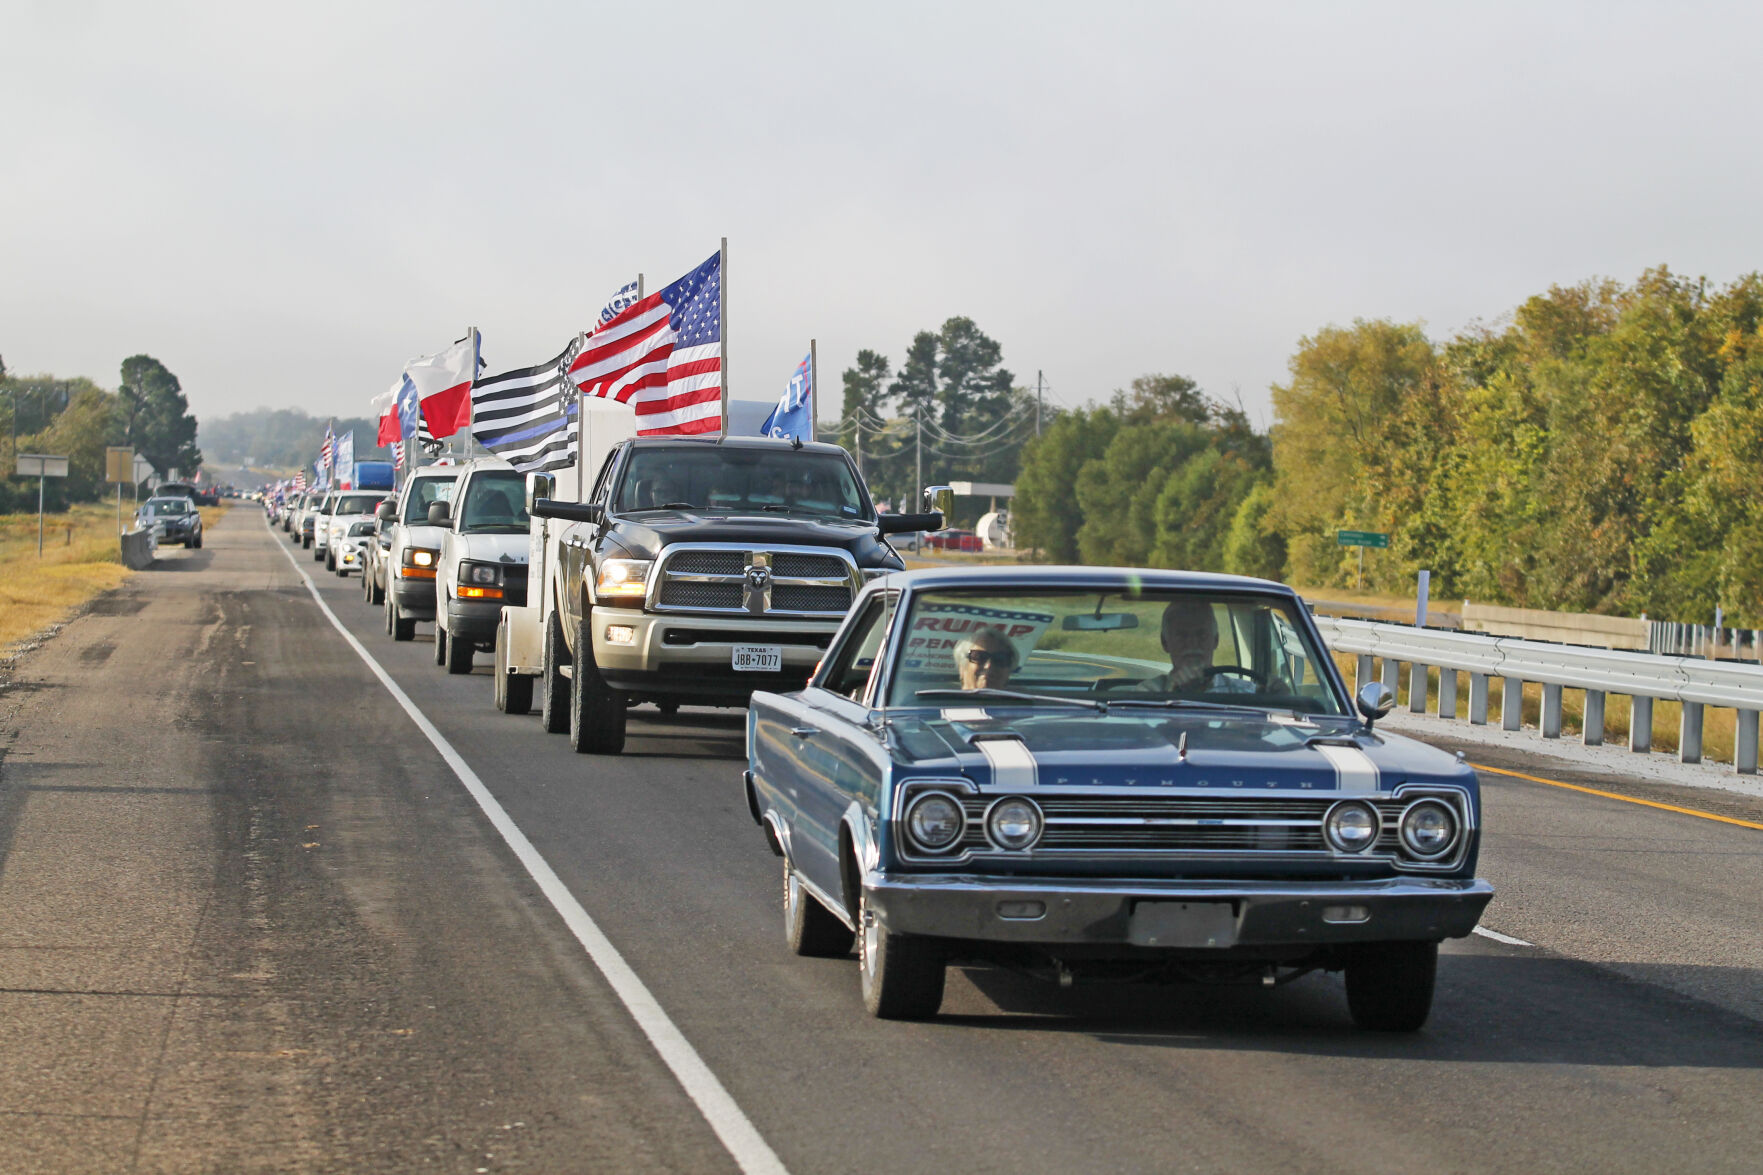 Republican group sets second Trump parade for Saturday